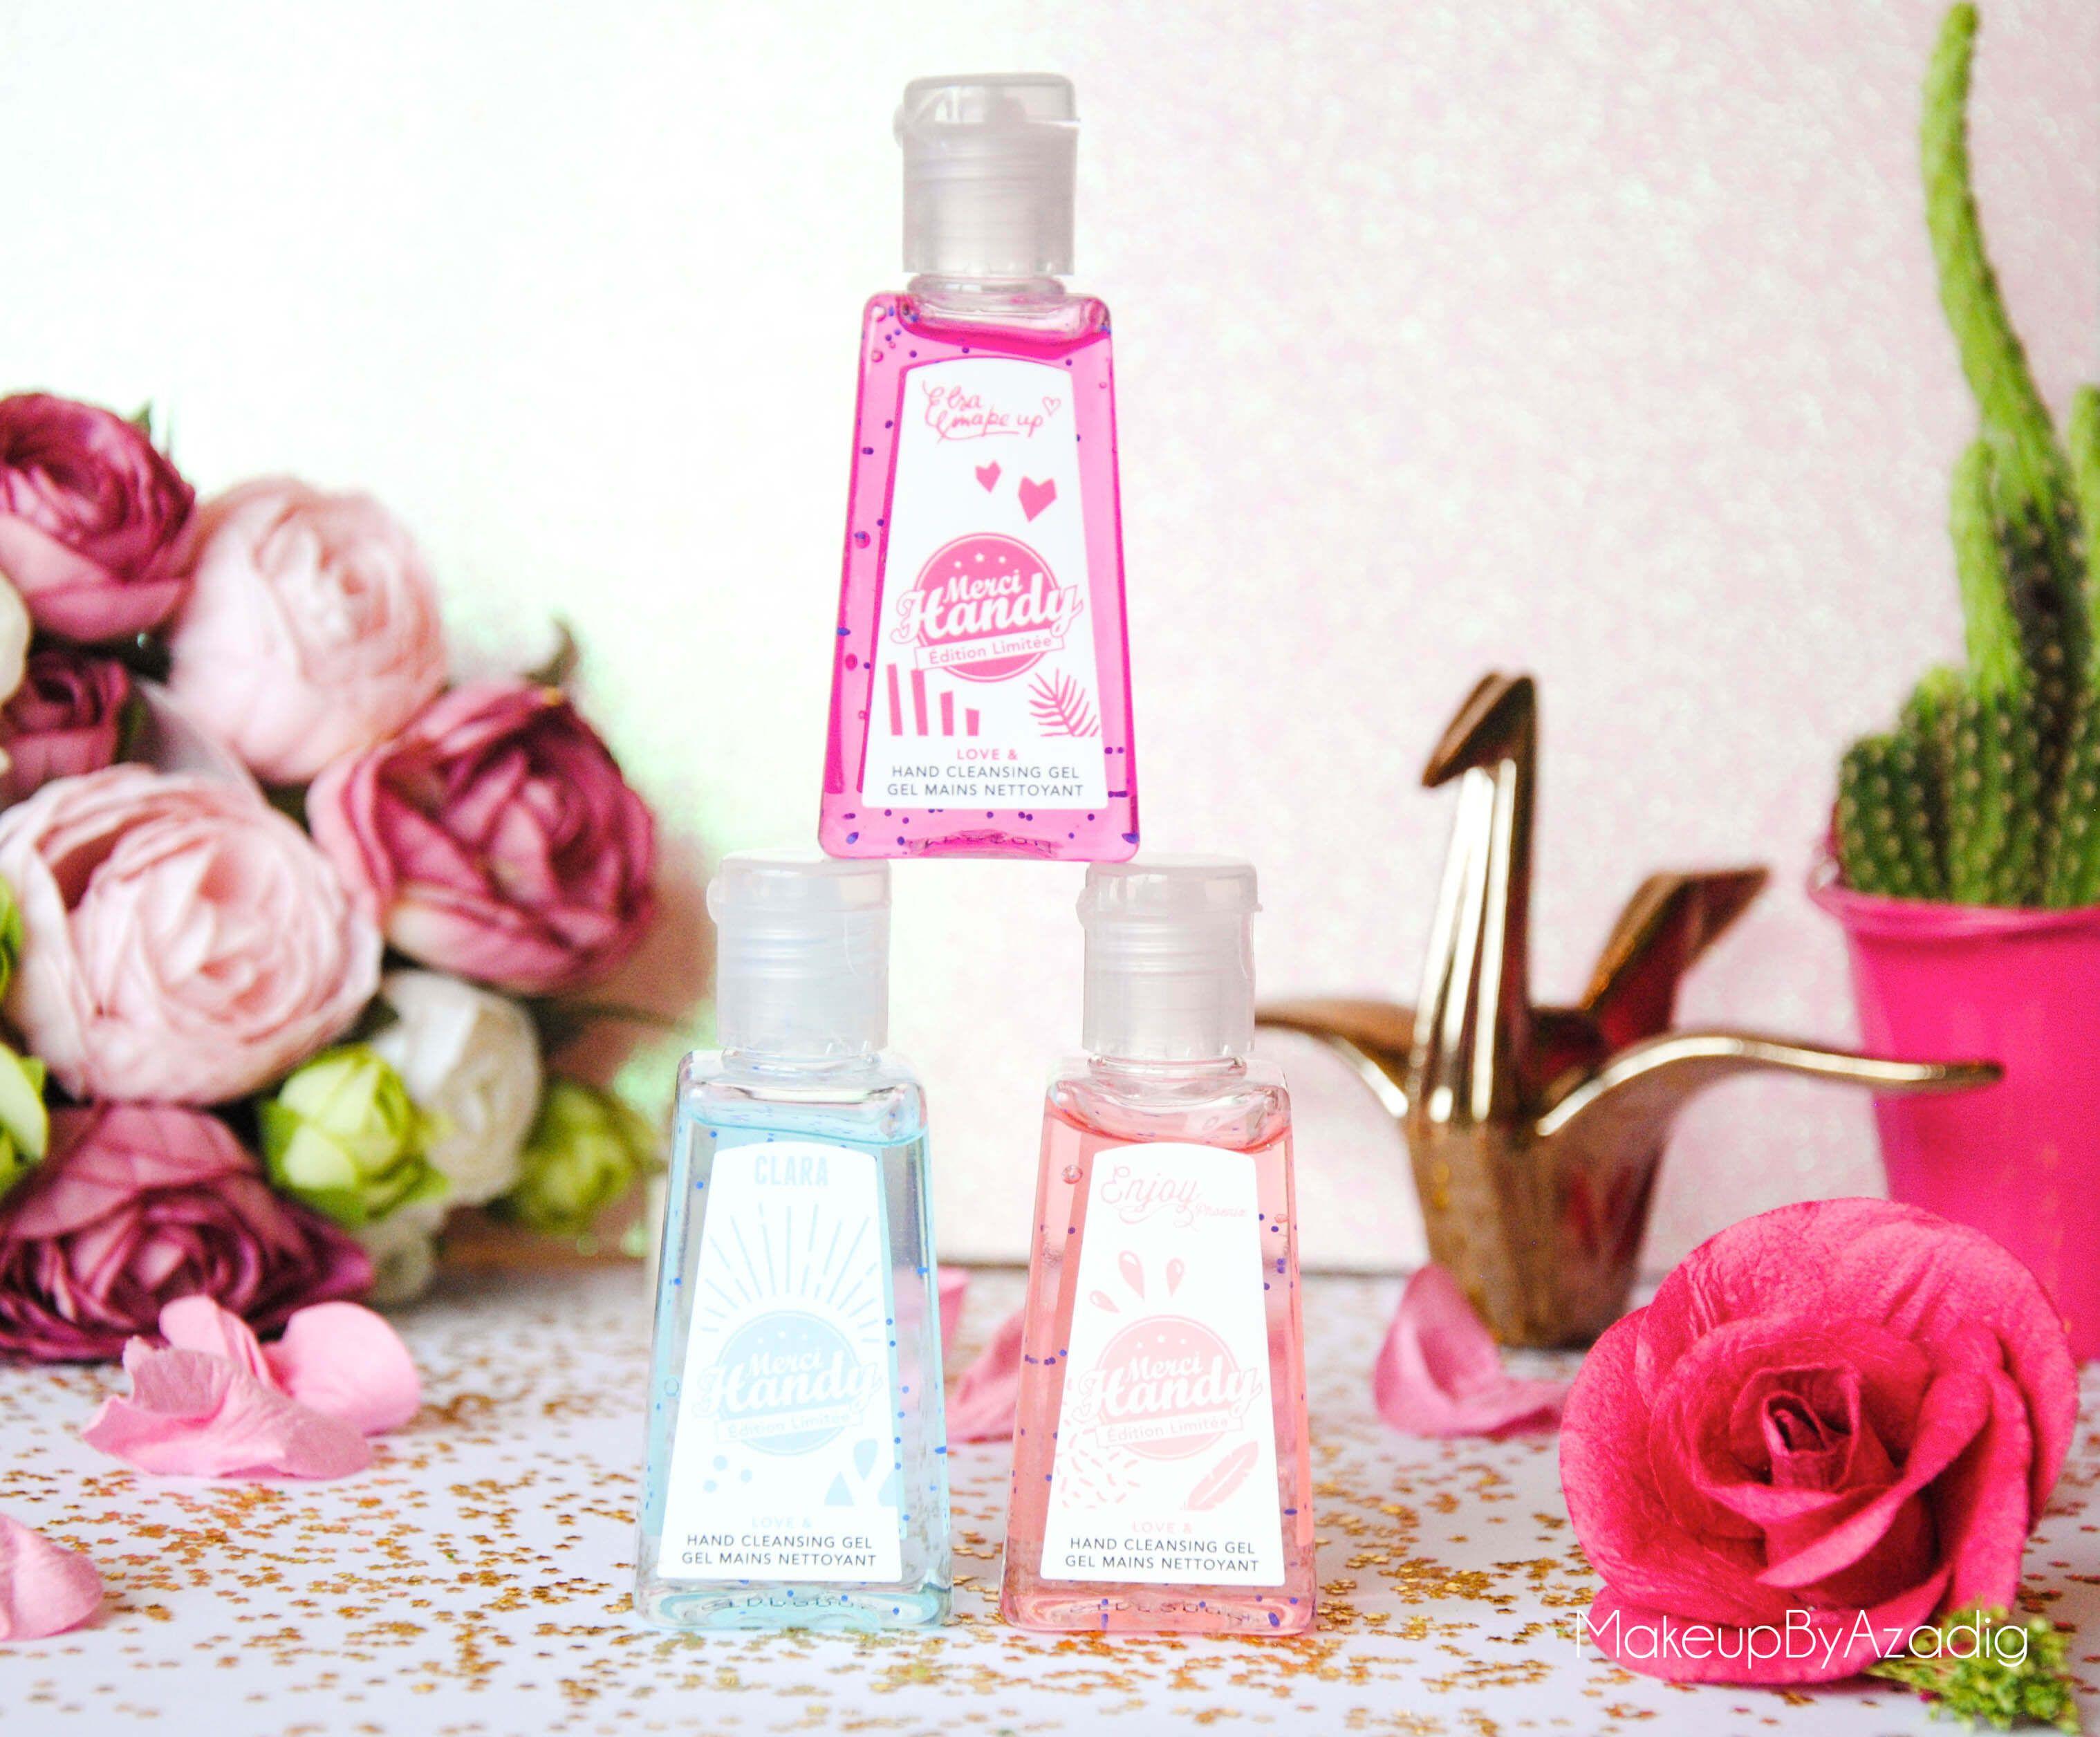 28 Revue Gels Merci Handy X Rose Carpet Accessoire Maquillage